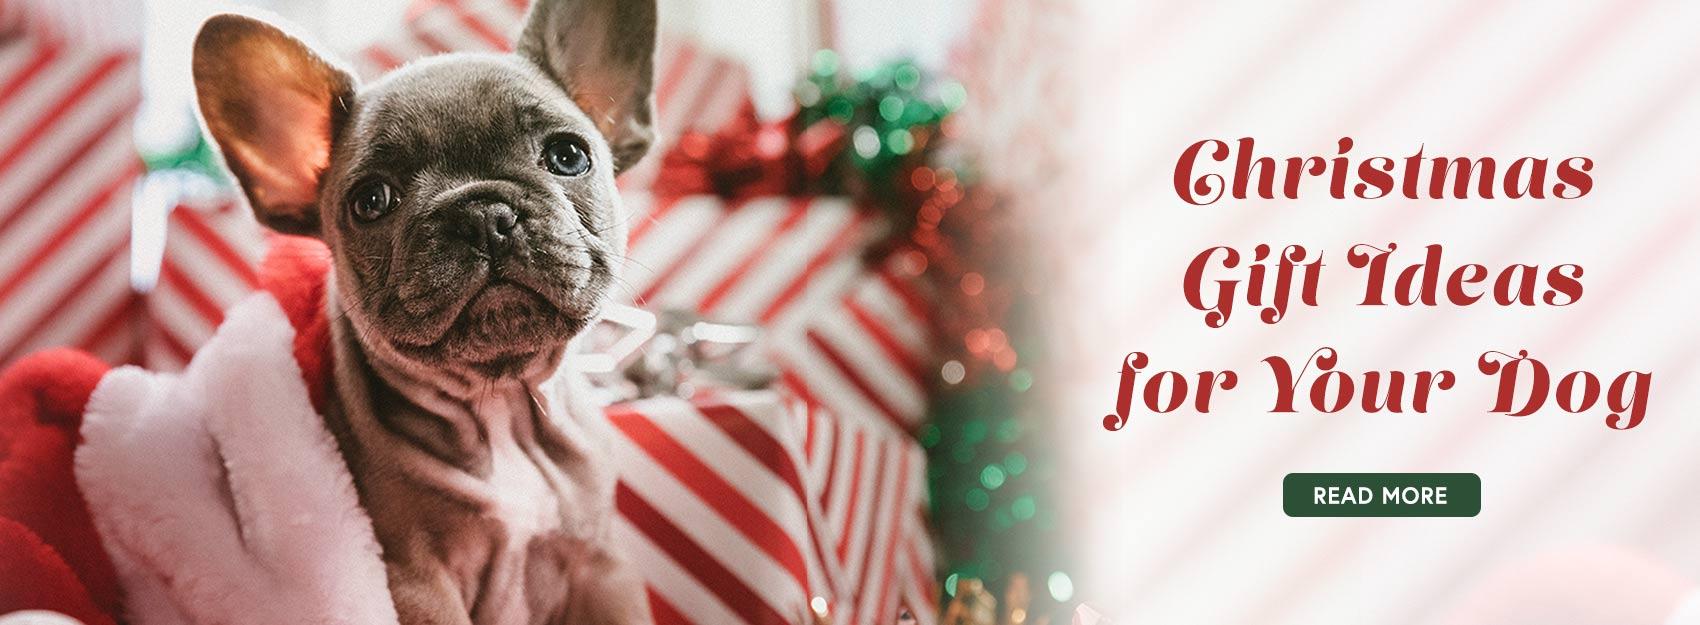 What Gift Should I Get My Dog for Christmas? | GreyDock Blog